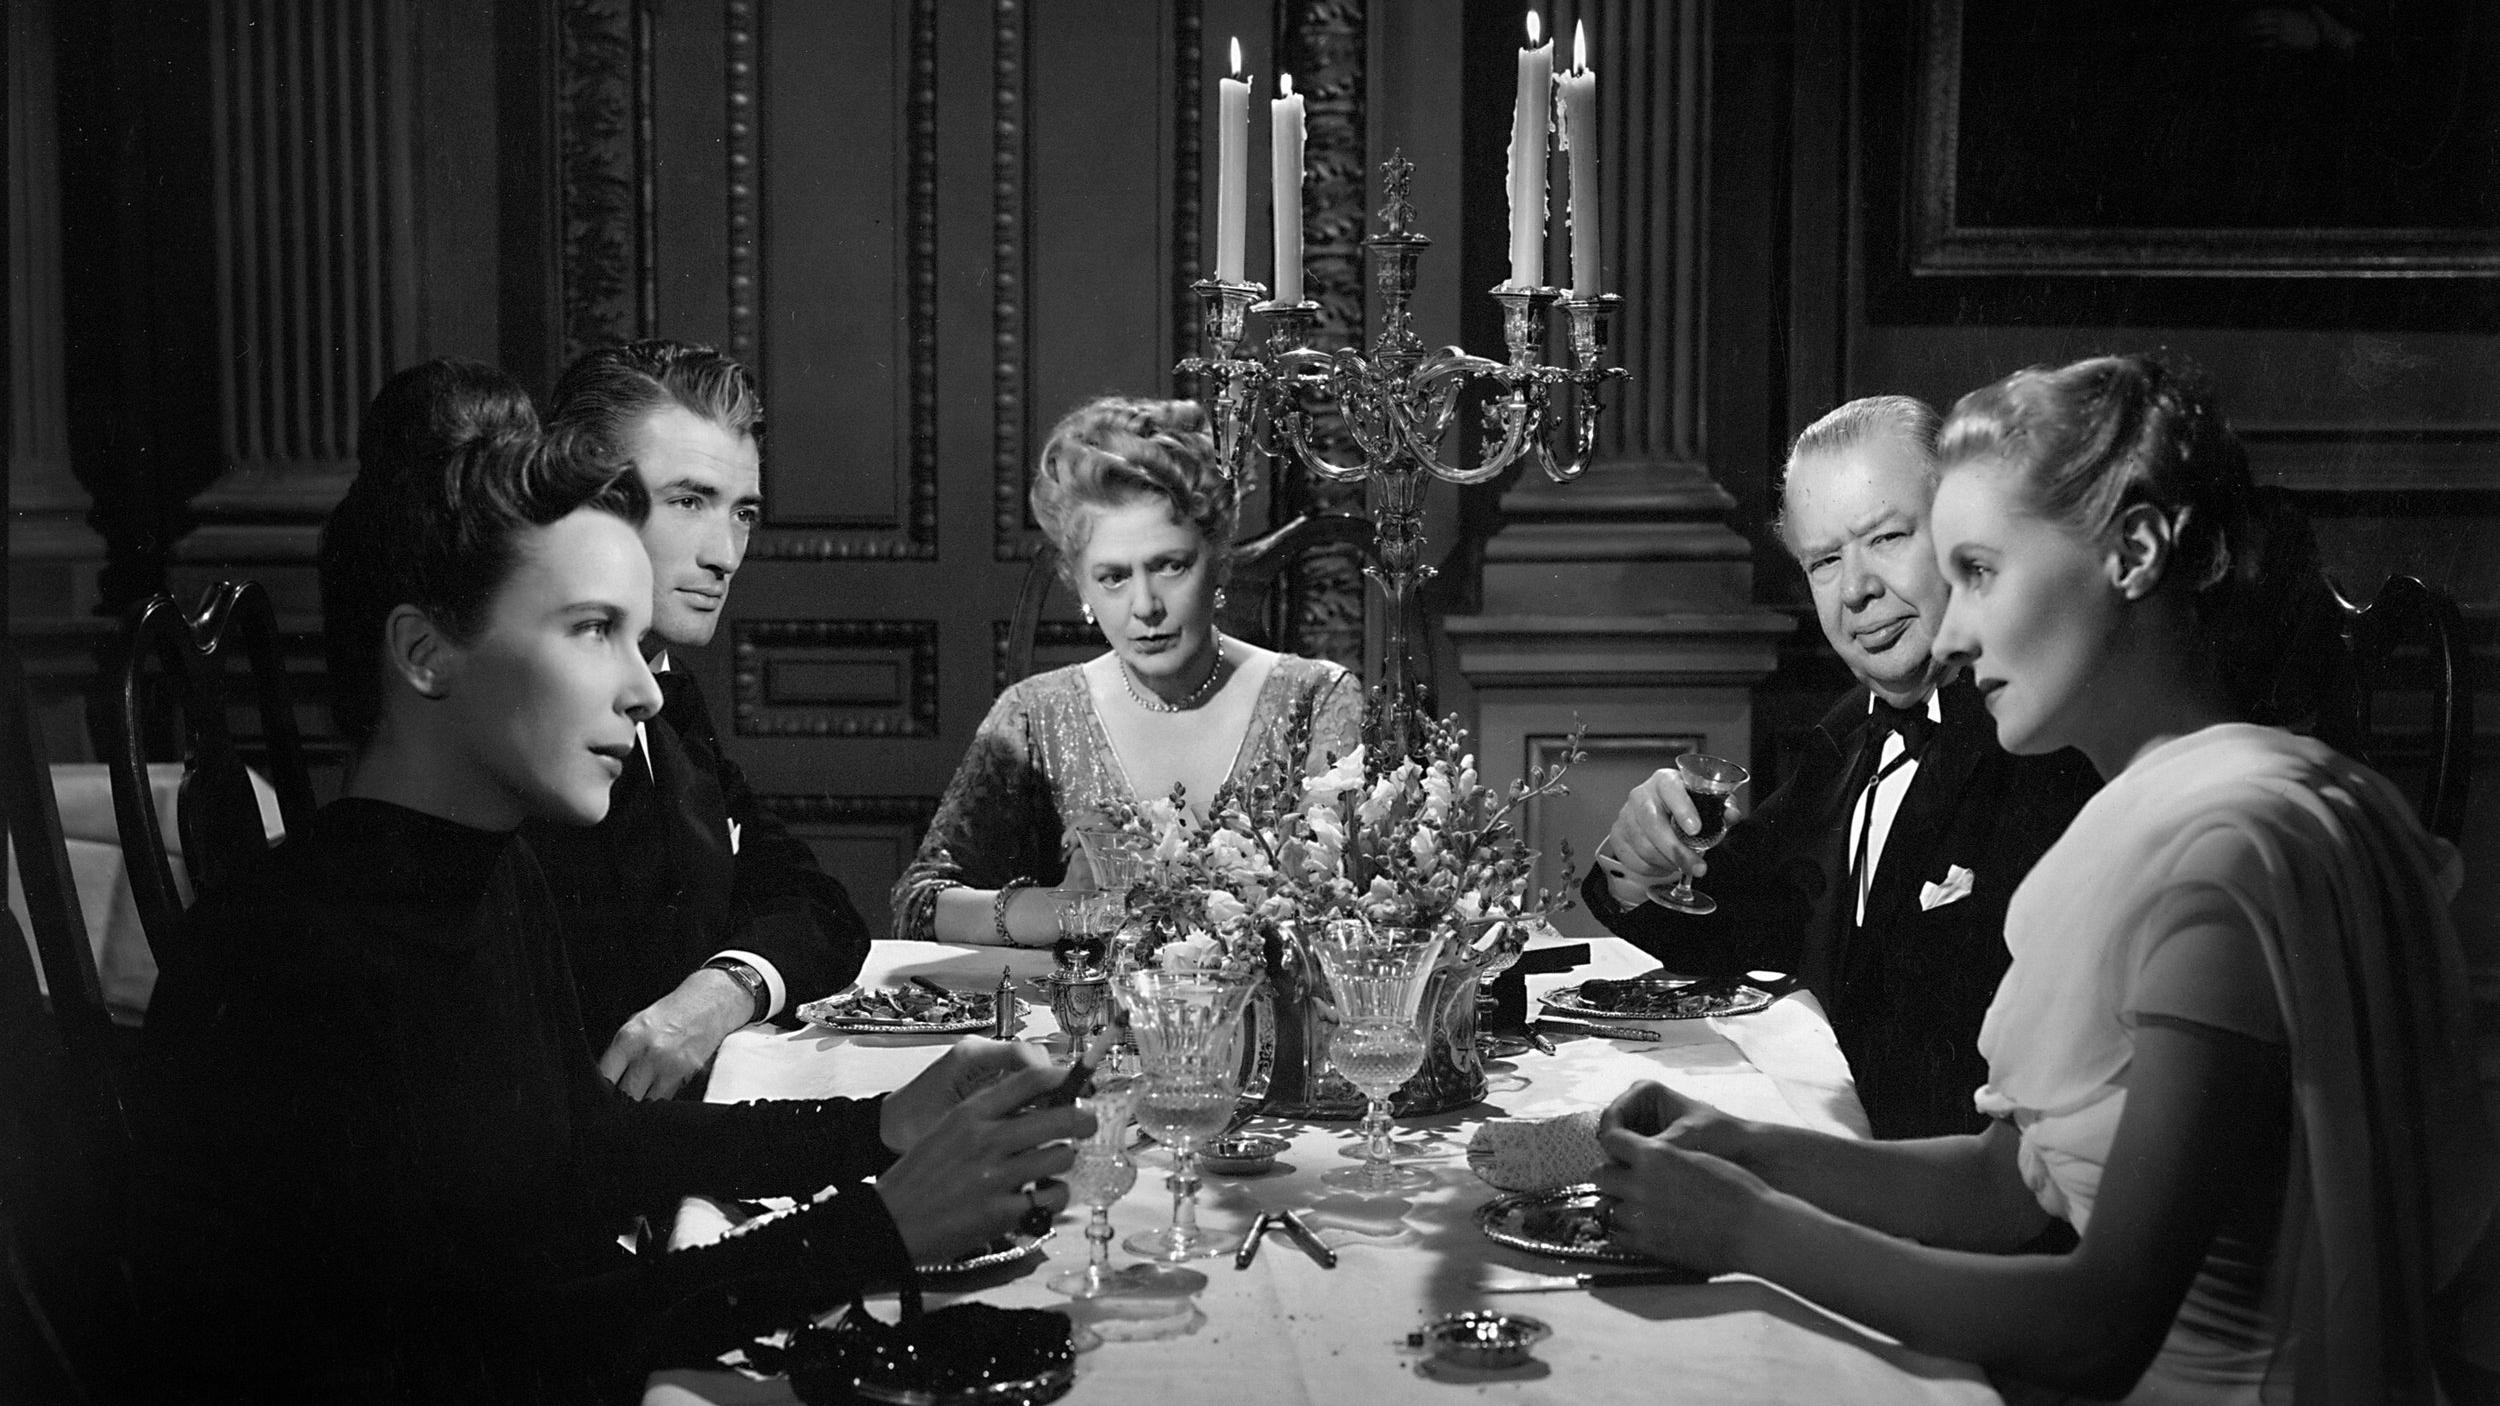 Ann Todd, Charles Laughton, Ethel Barrymore, Gregory Peck, Alida Valli, Louis Jourdan, Alfred Hitchcock,